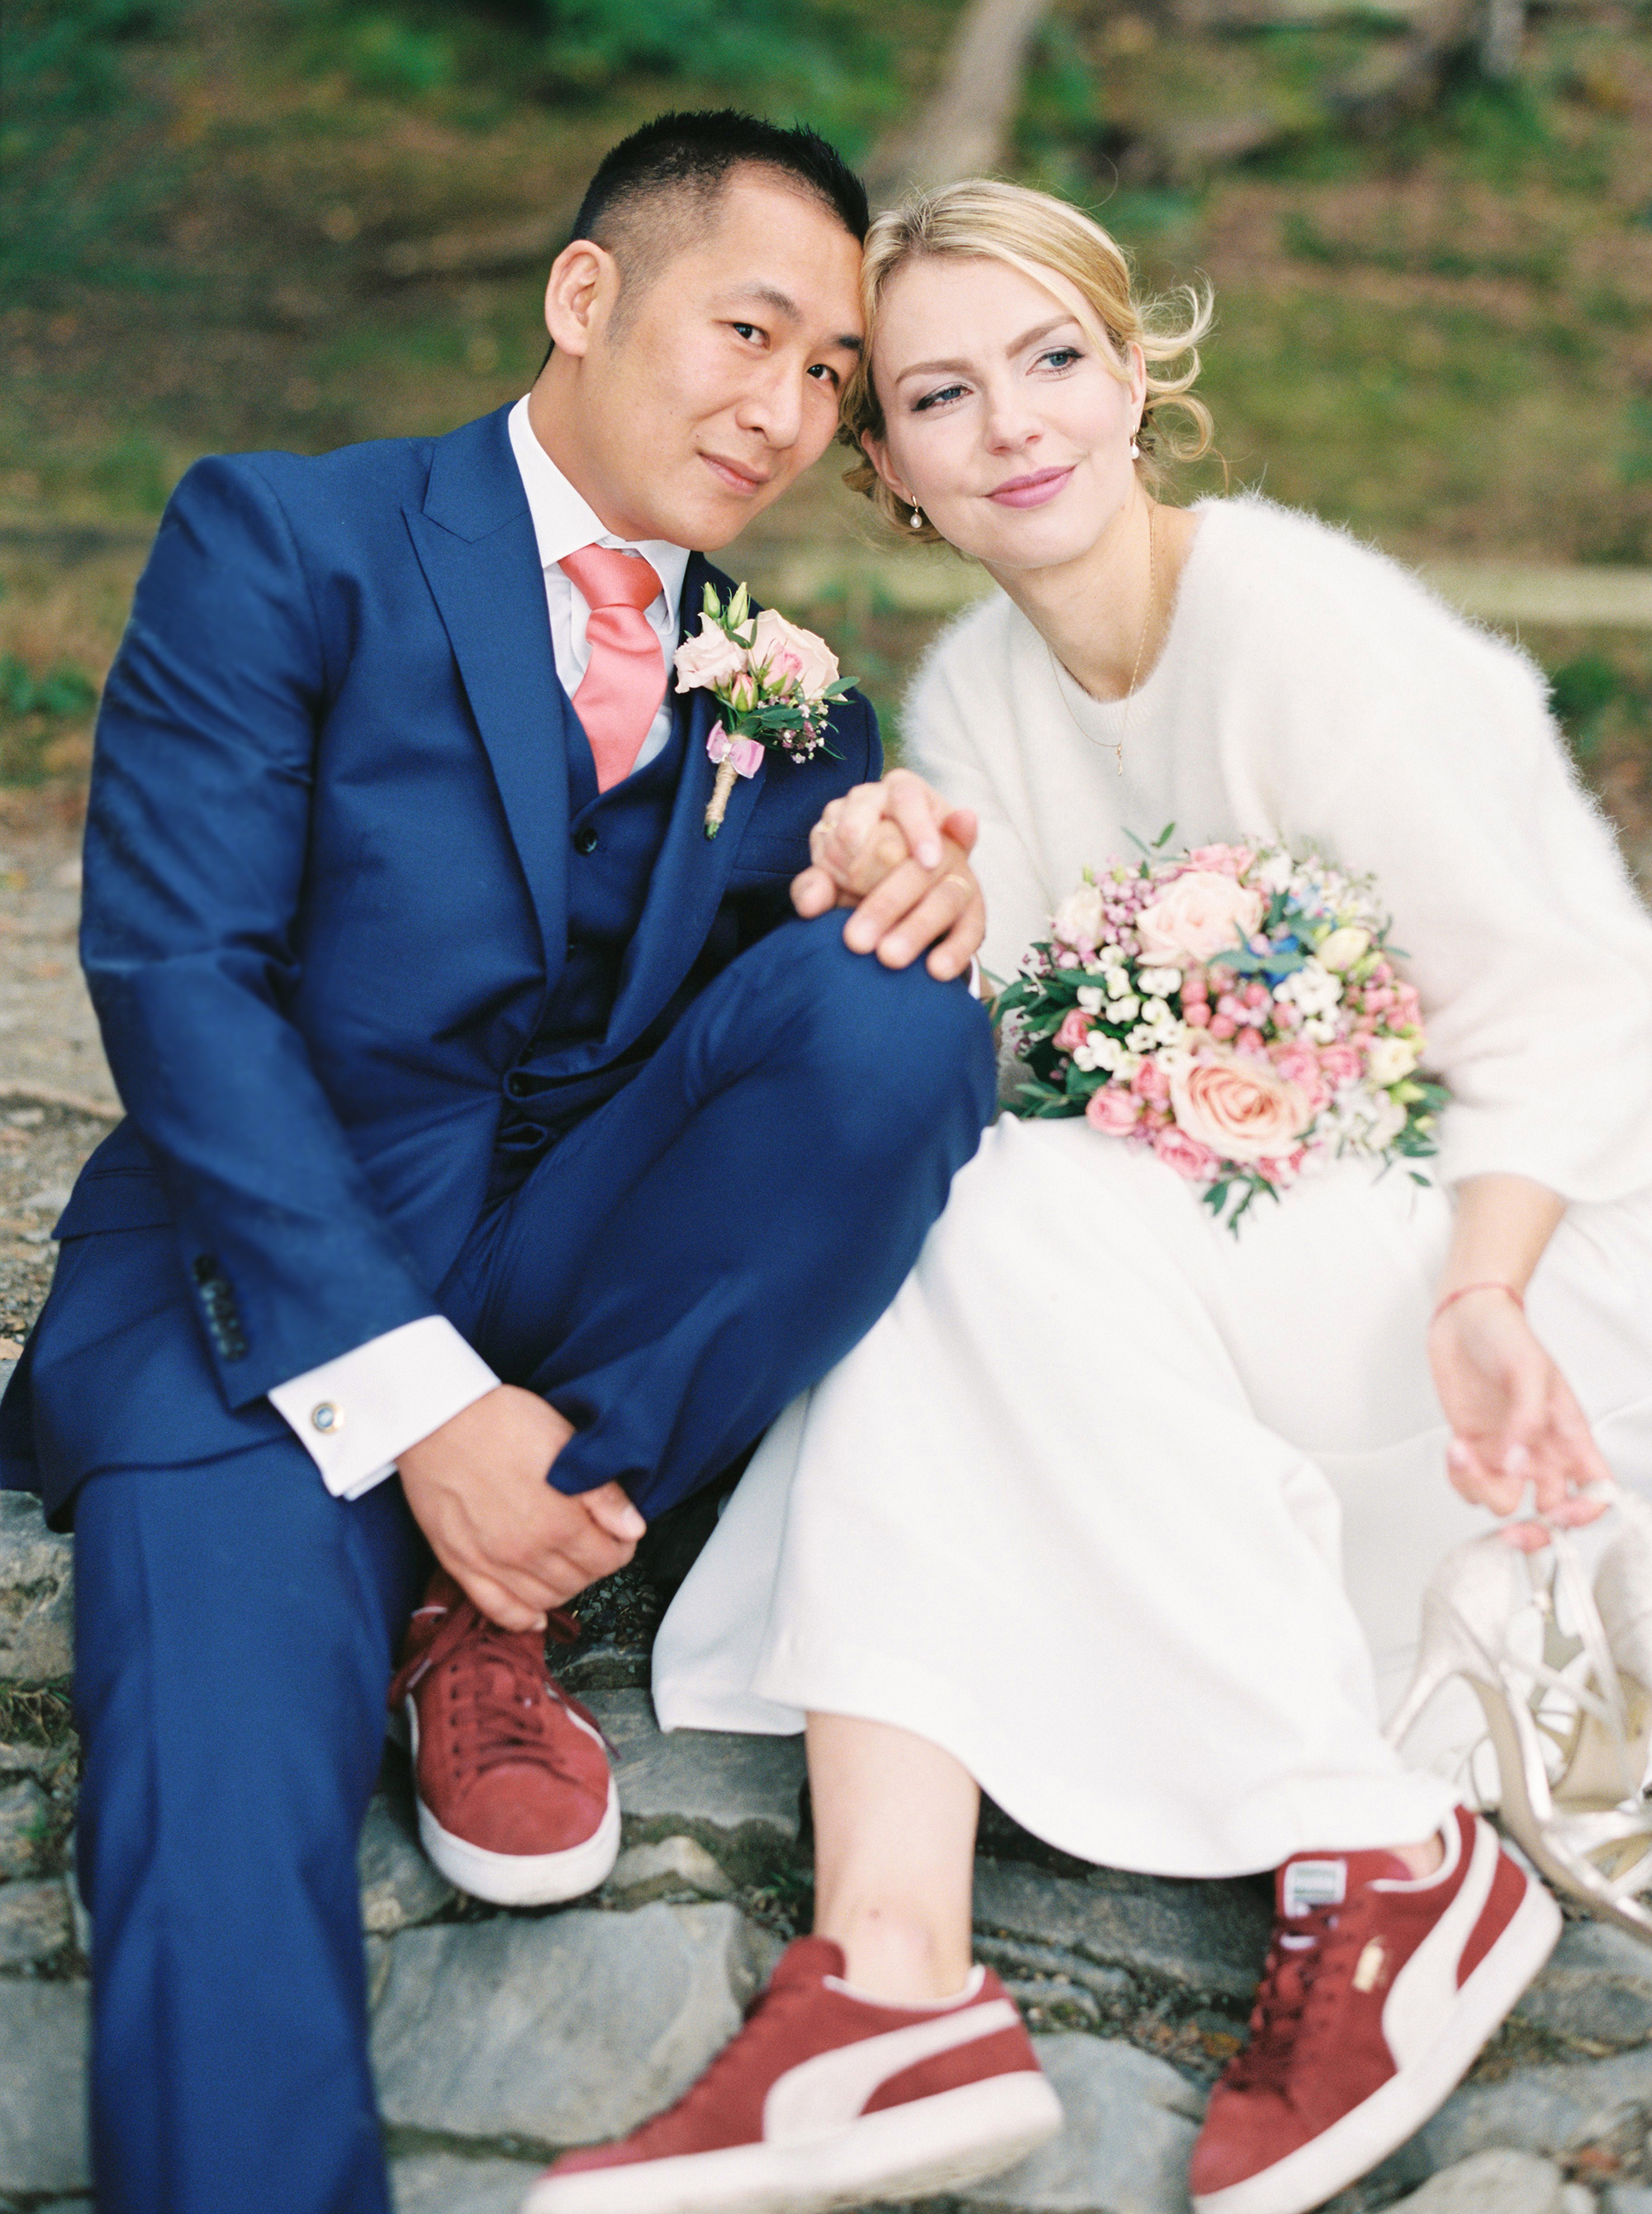 wedding_photographer_cumbria160.jpg